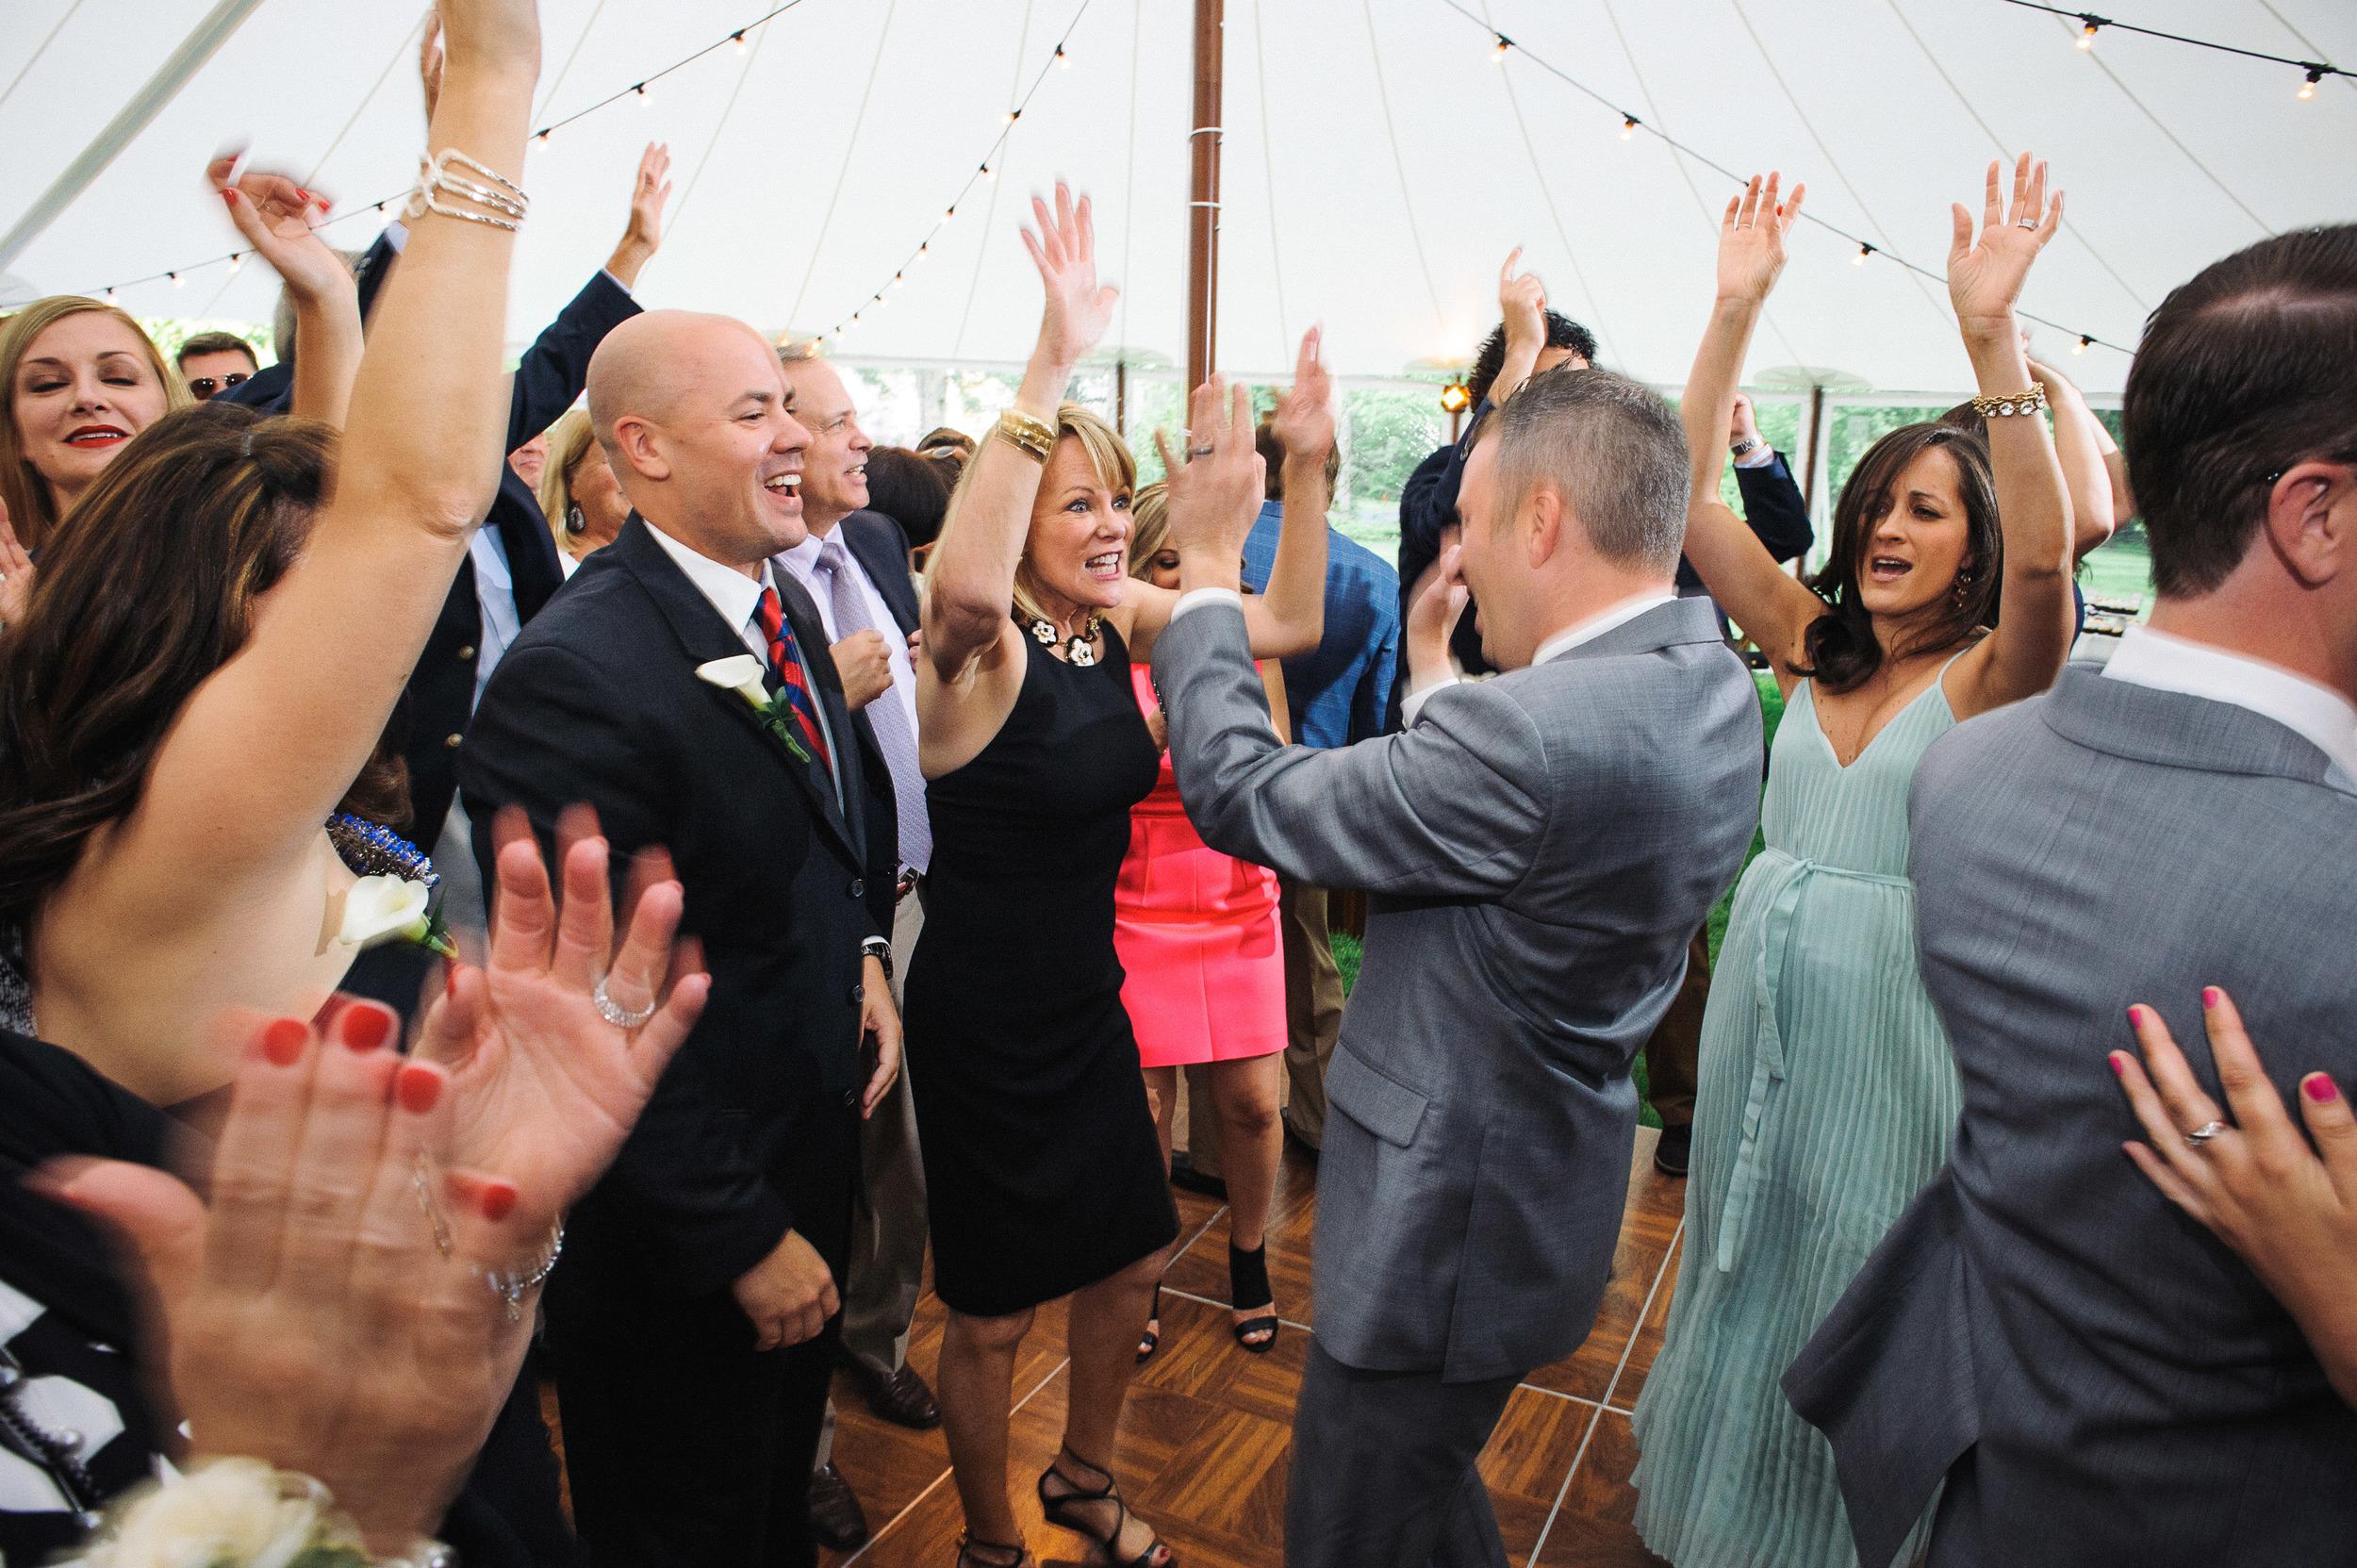 Aviation Themed Wedding Gay Wedding LGBT018.JPG